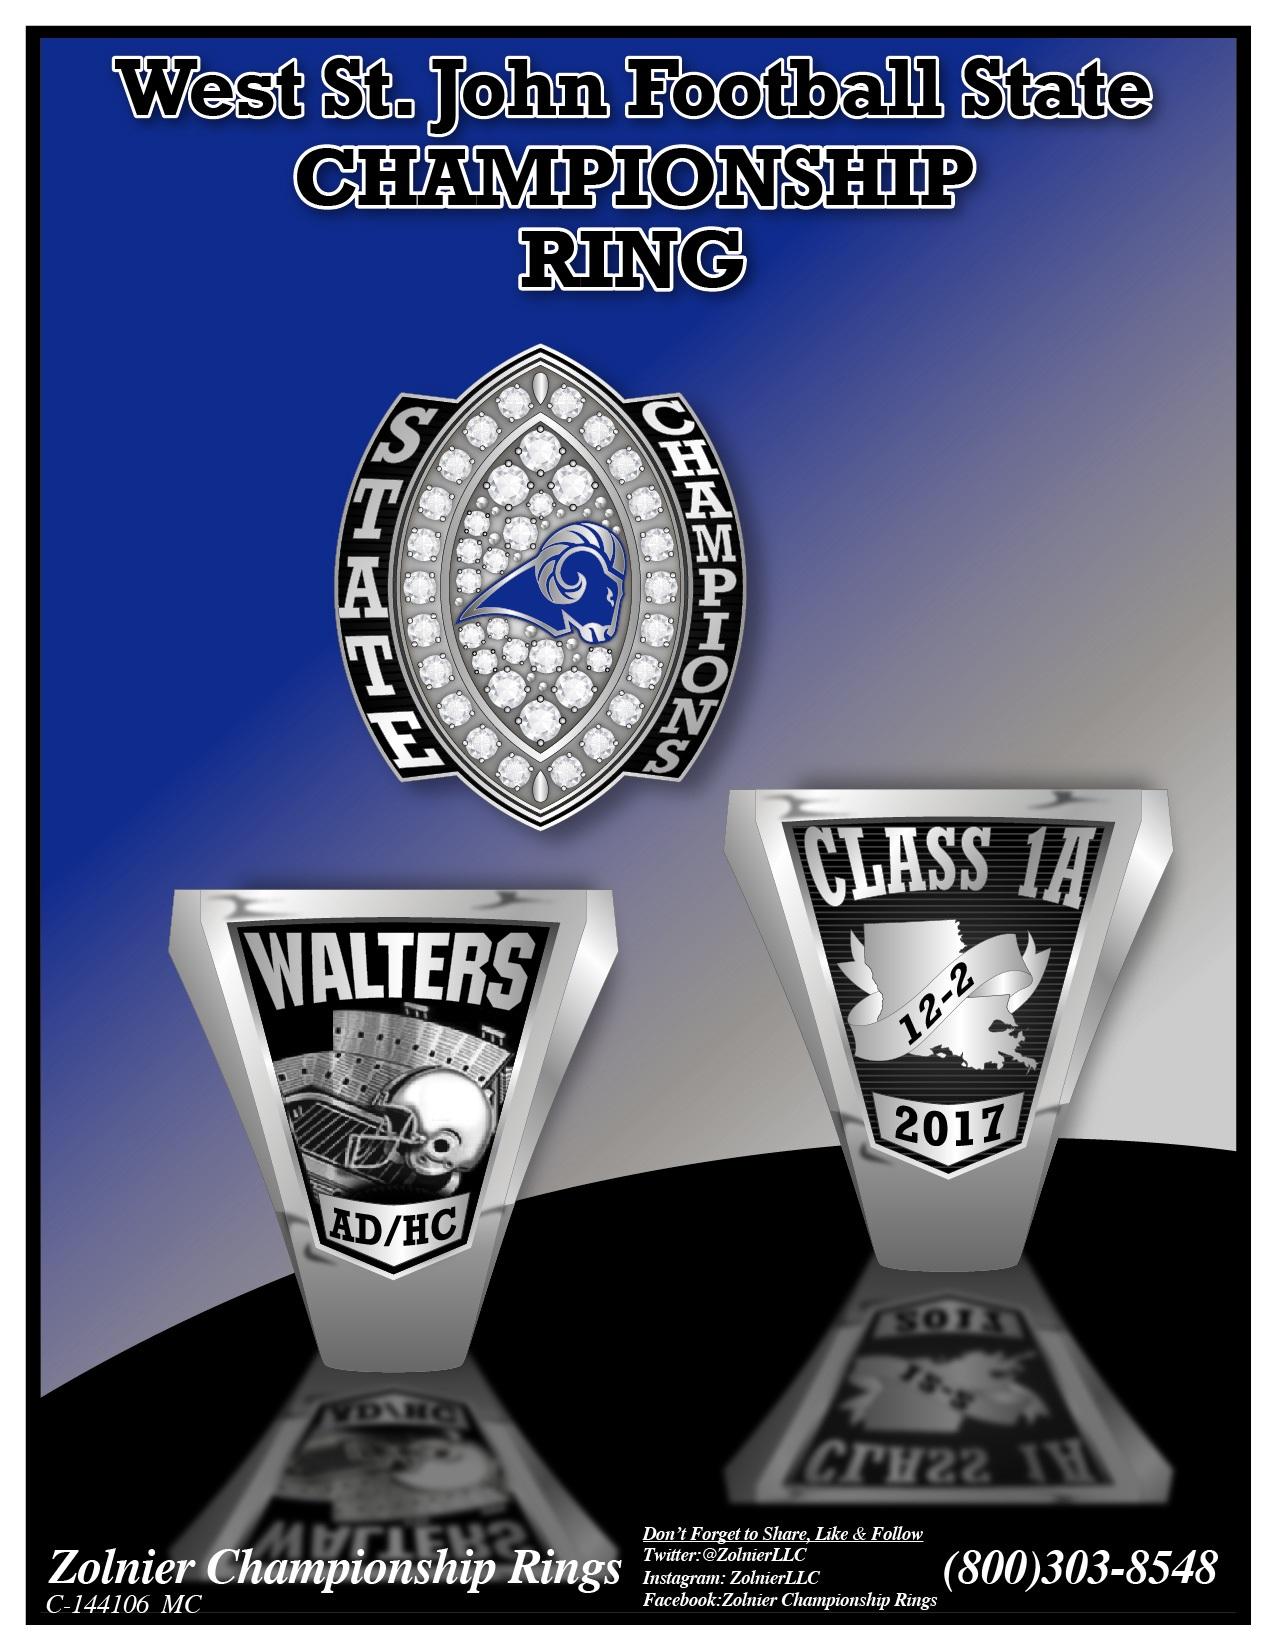 C-144106 West St. John HS FB Champ Ring